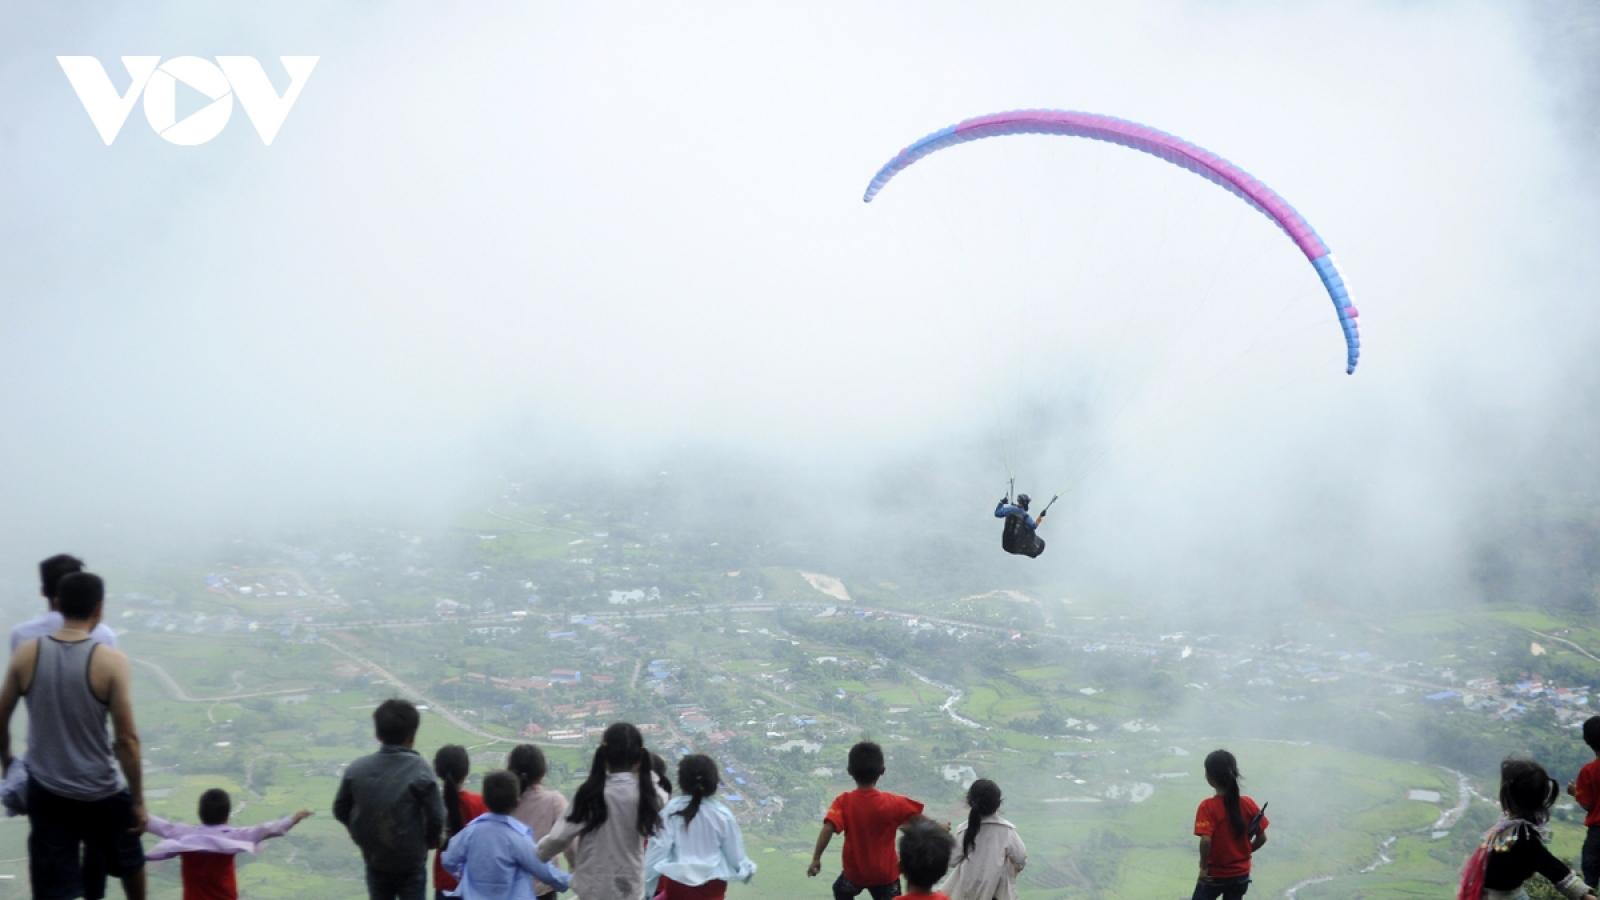 Lai Chau culture and tourism week slated for November